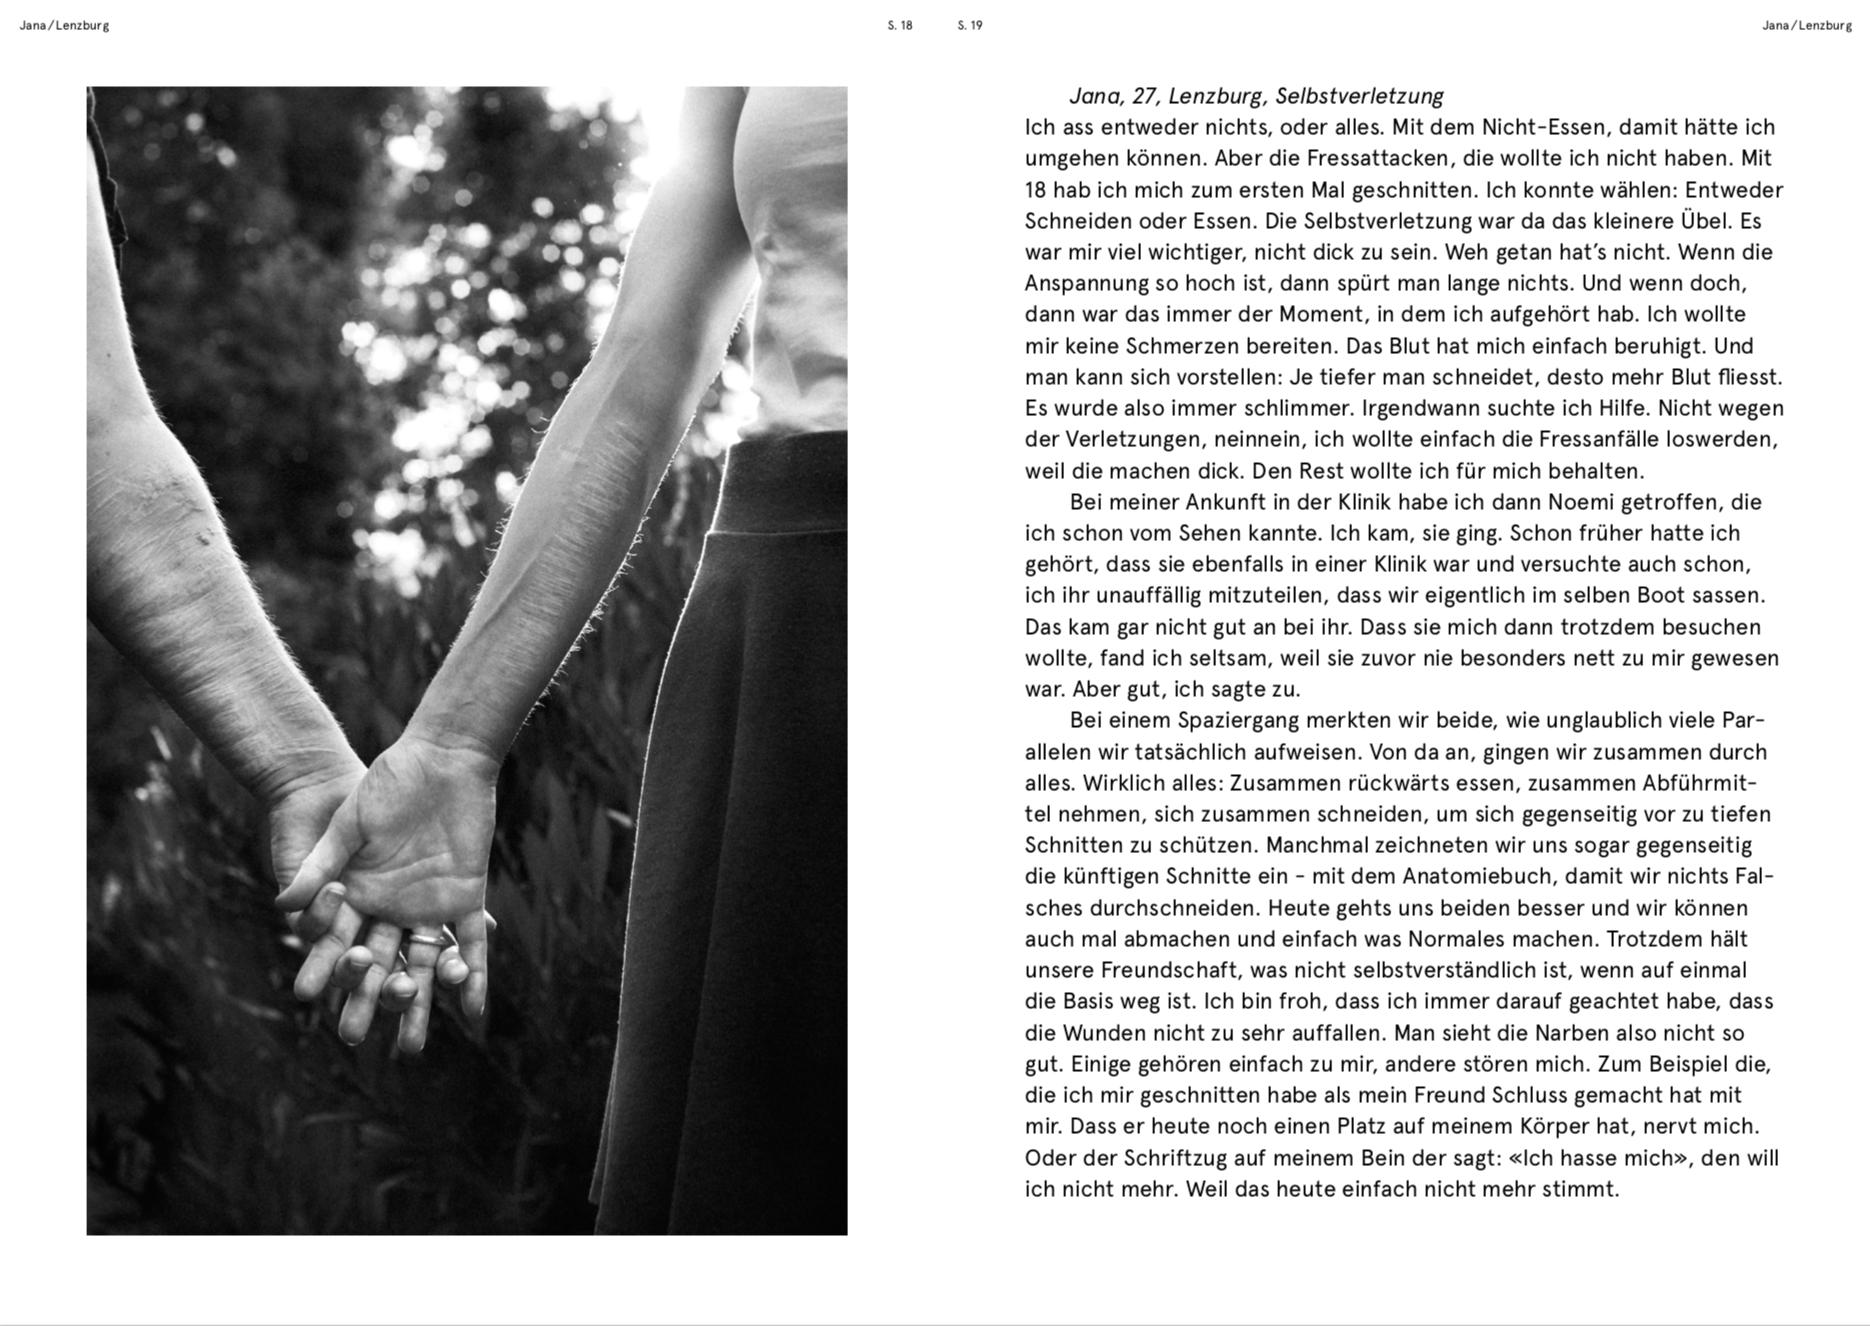 O-TON JANA / NARBEN-PROJEKT MIT FOTOGRAFIN CLAUDIA GSCHWEND